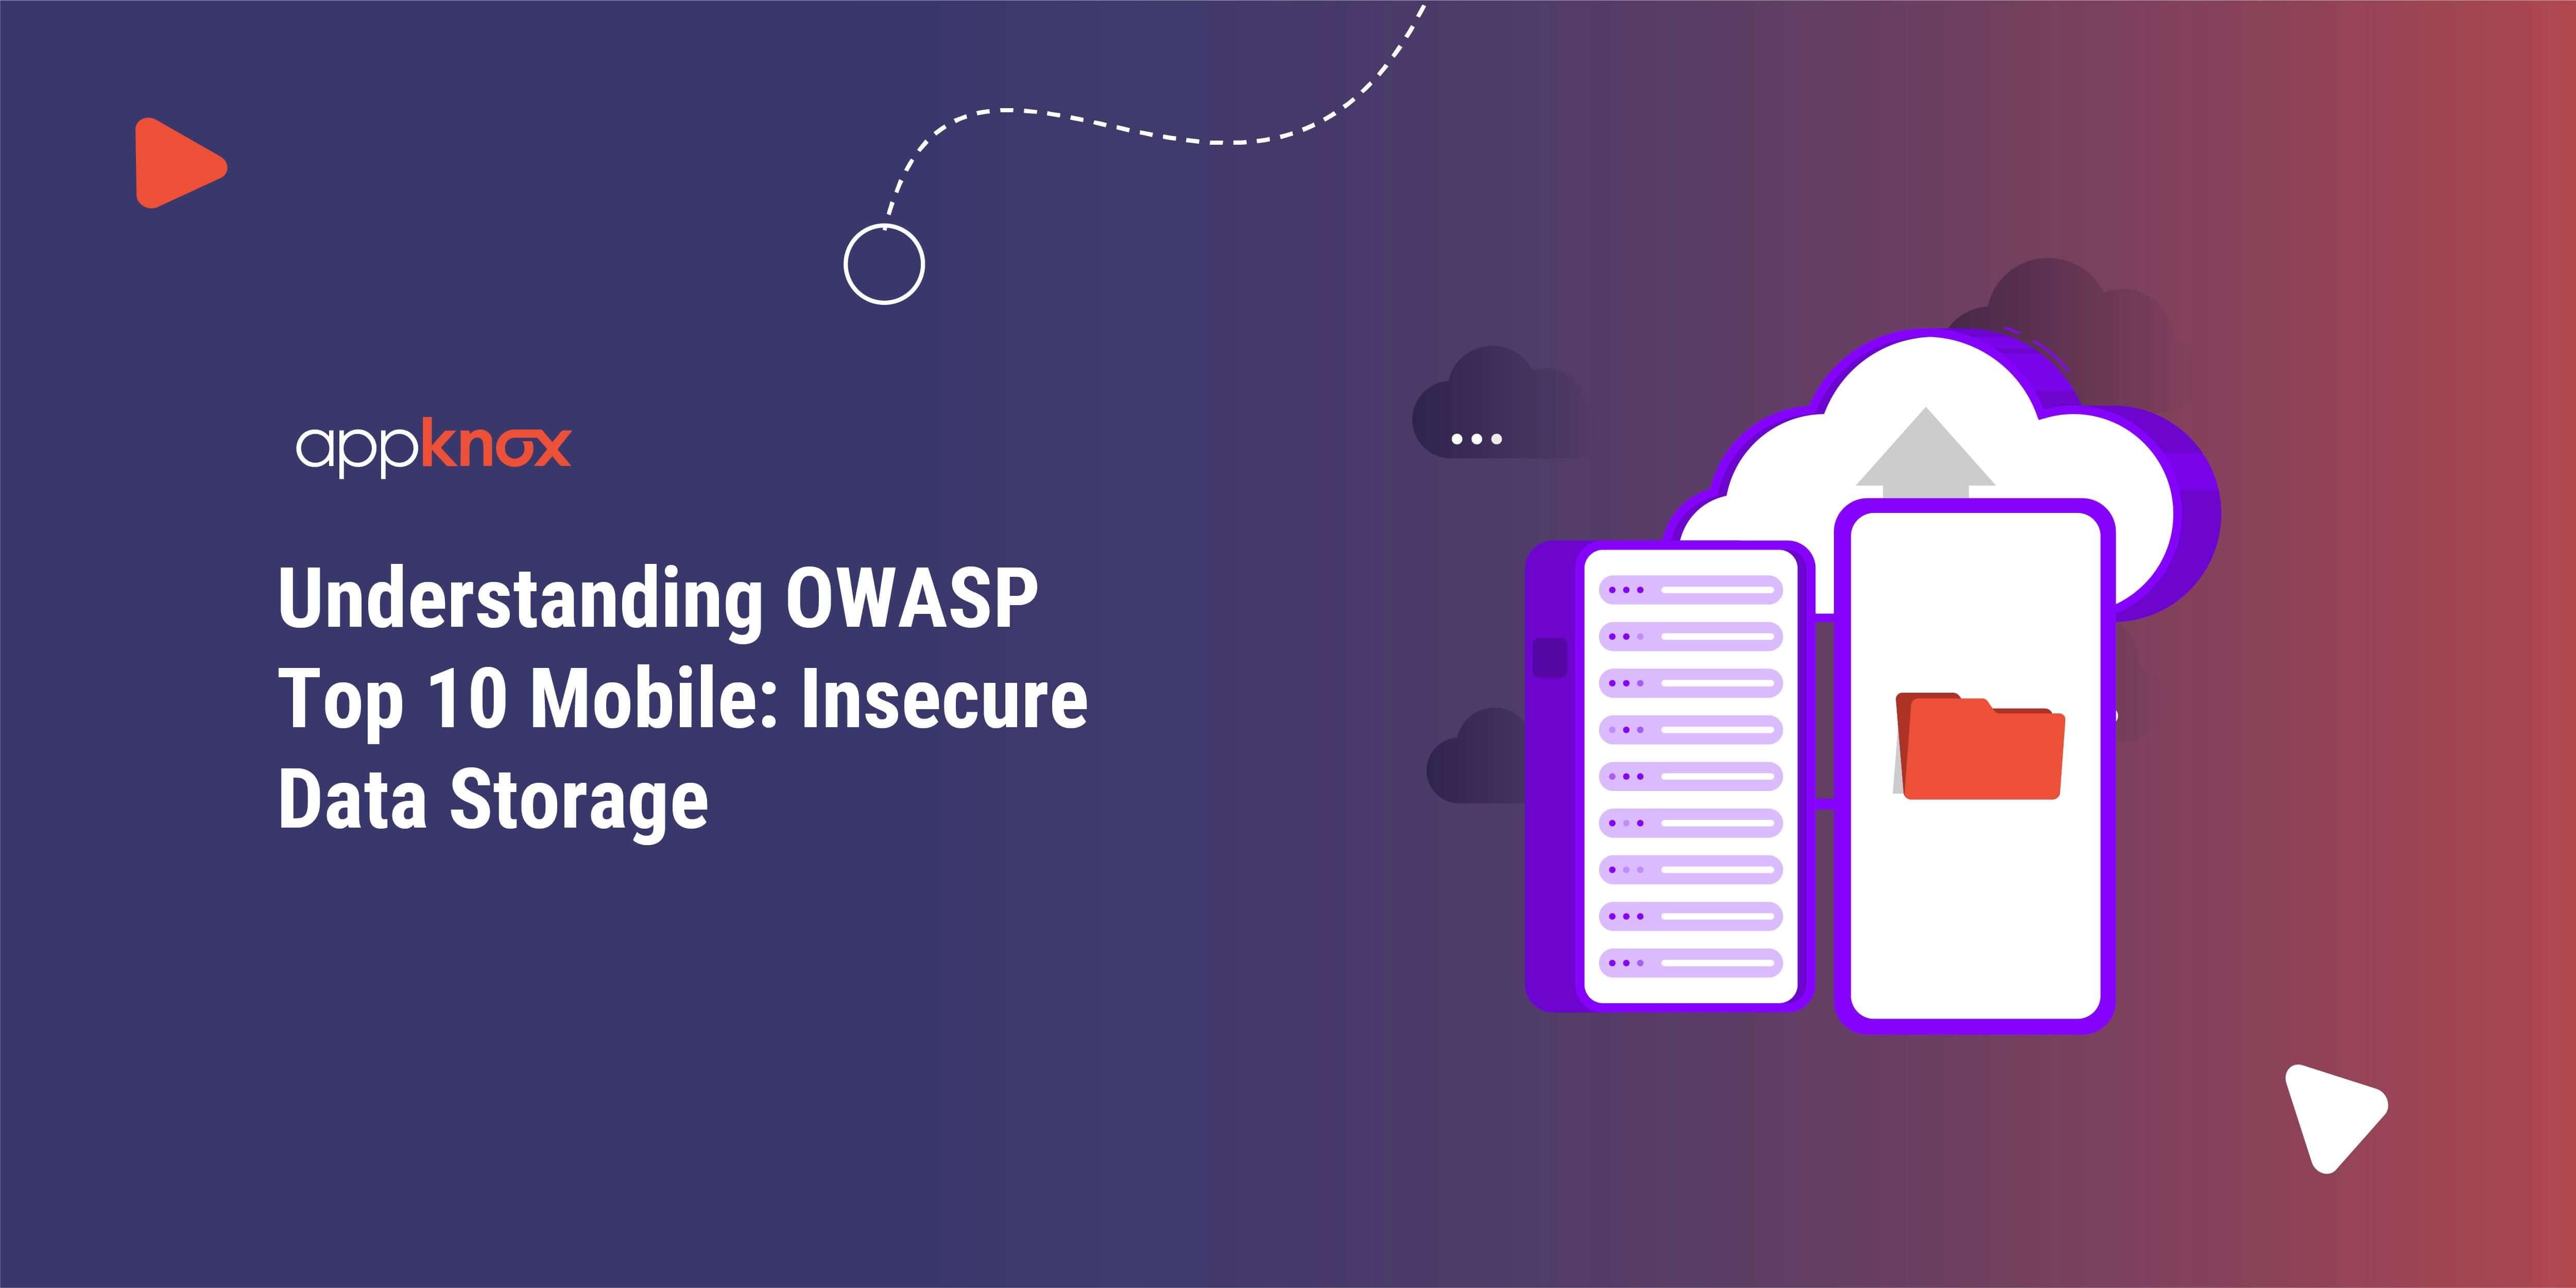 Understanding OWASP Top 10 Mobile: Insecure Data Storage